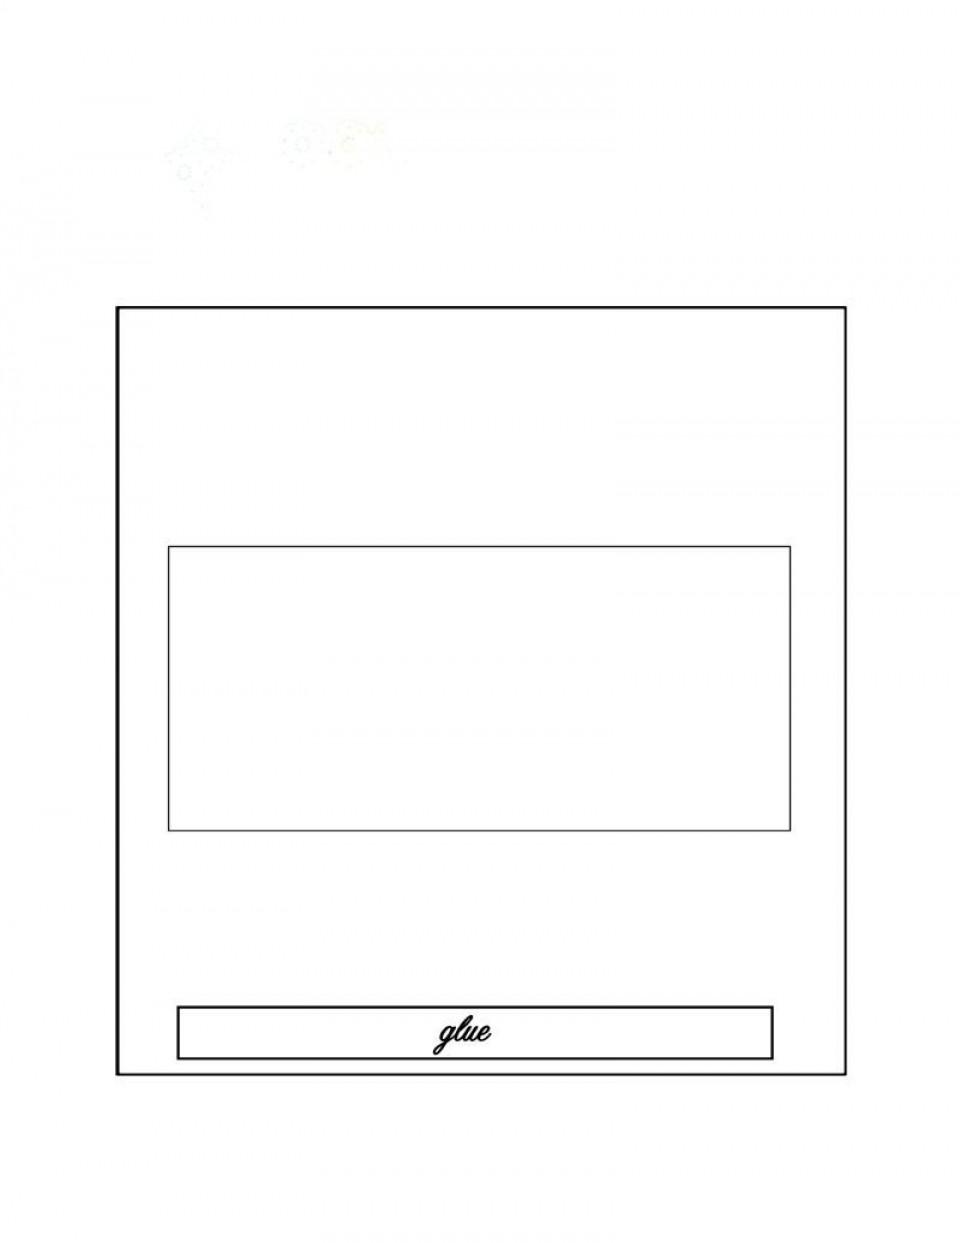 006 Wondrou Candy Bar Wrapper Template Measurement Example  Dimension960